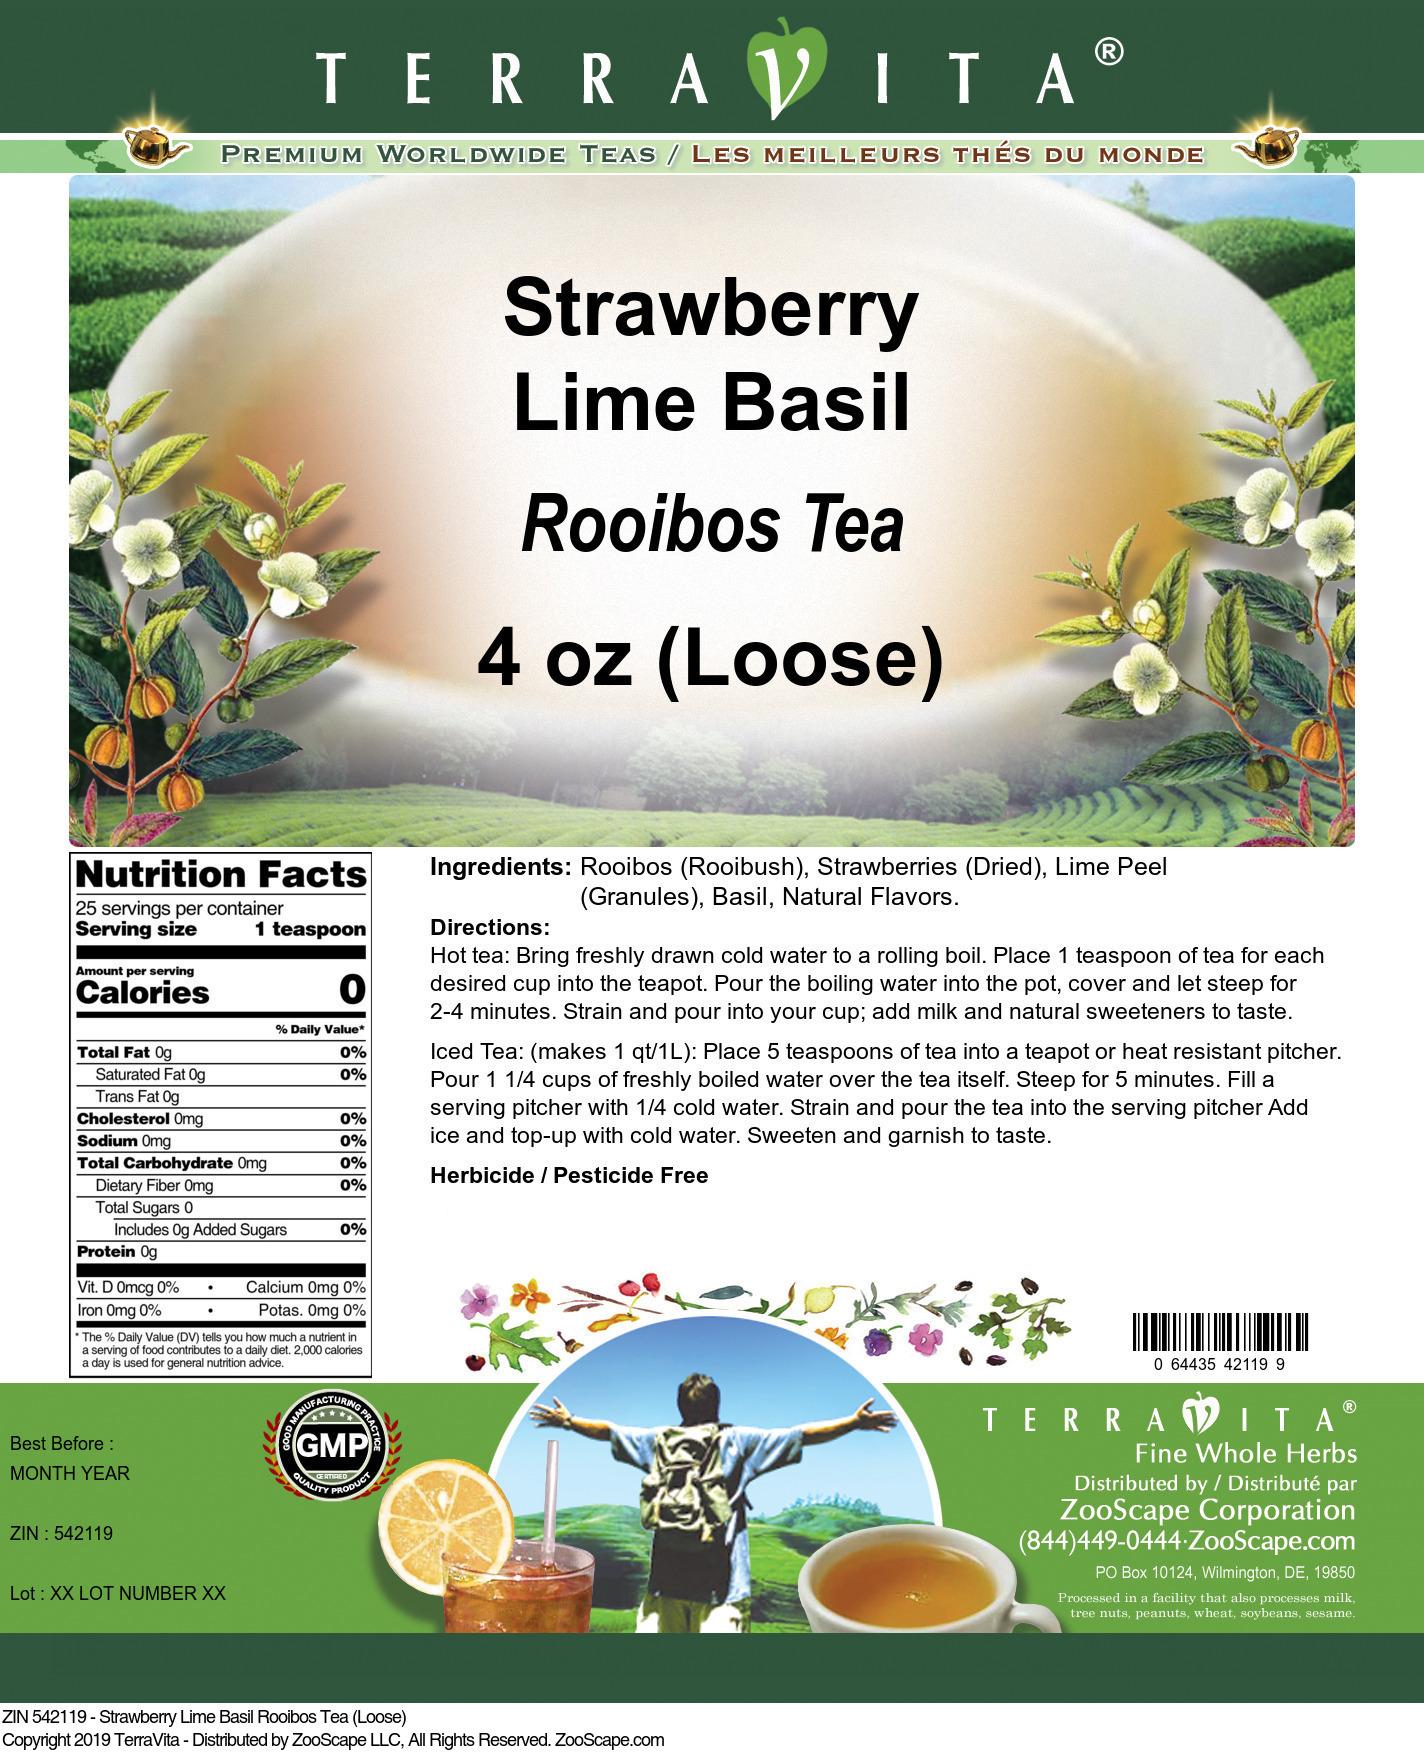 Strawberry Lime Basil Rooibos Tea (Loose)